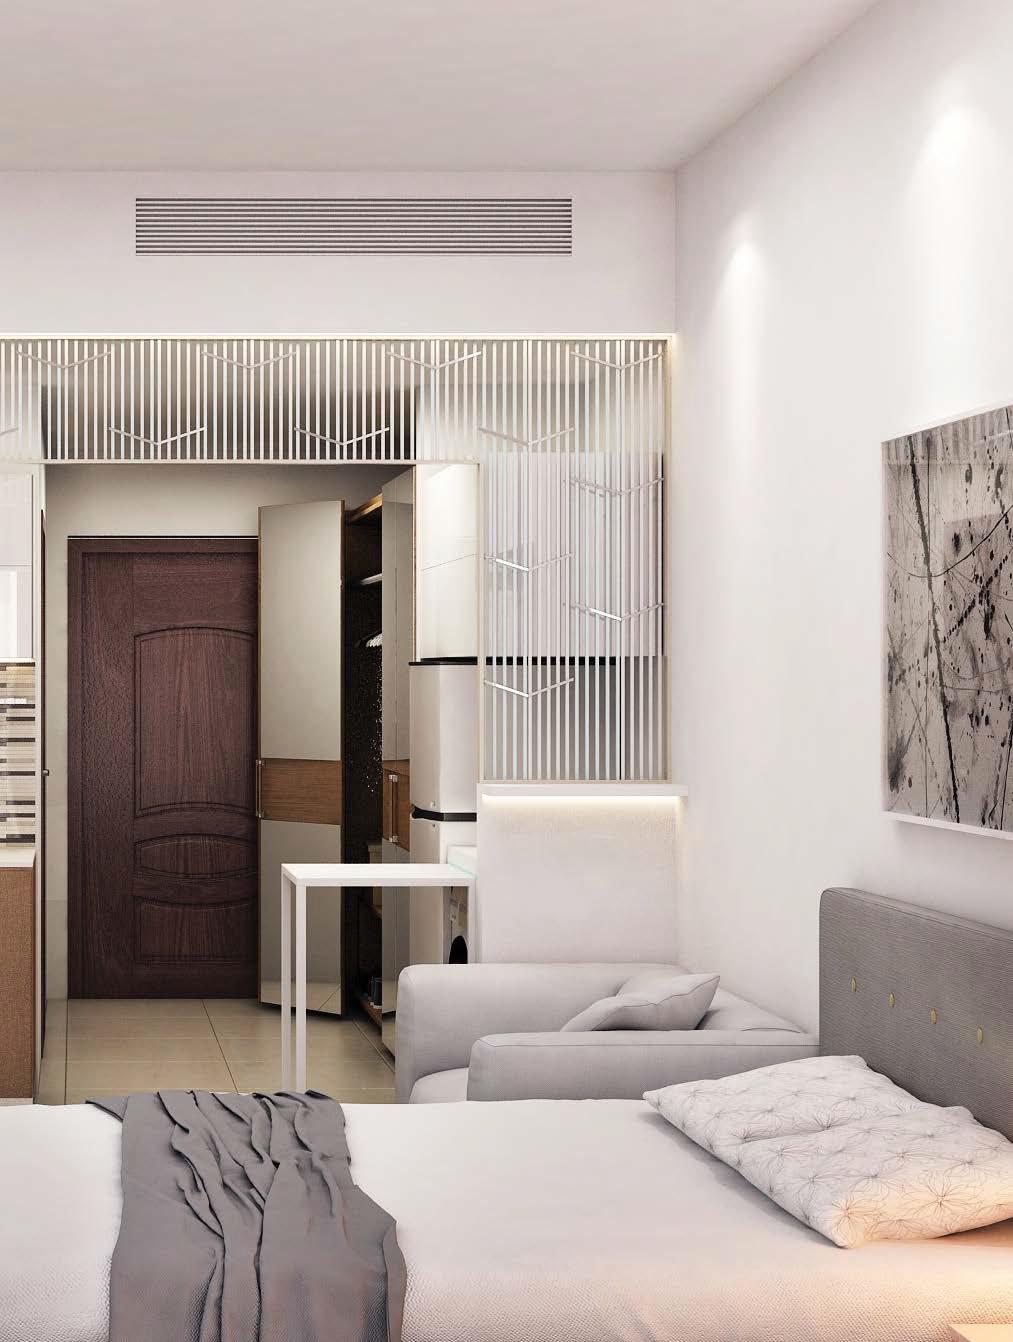 shaista serviced apartments apartment interiors6